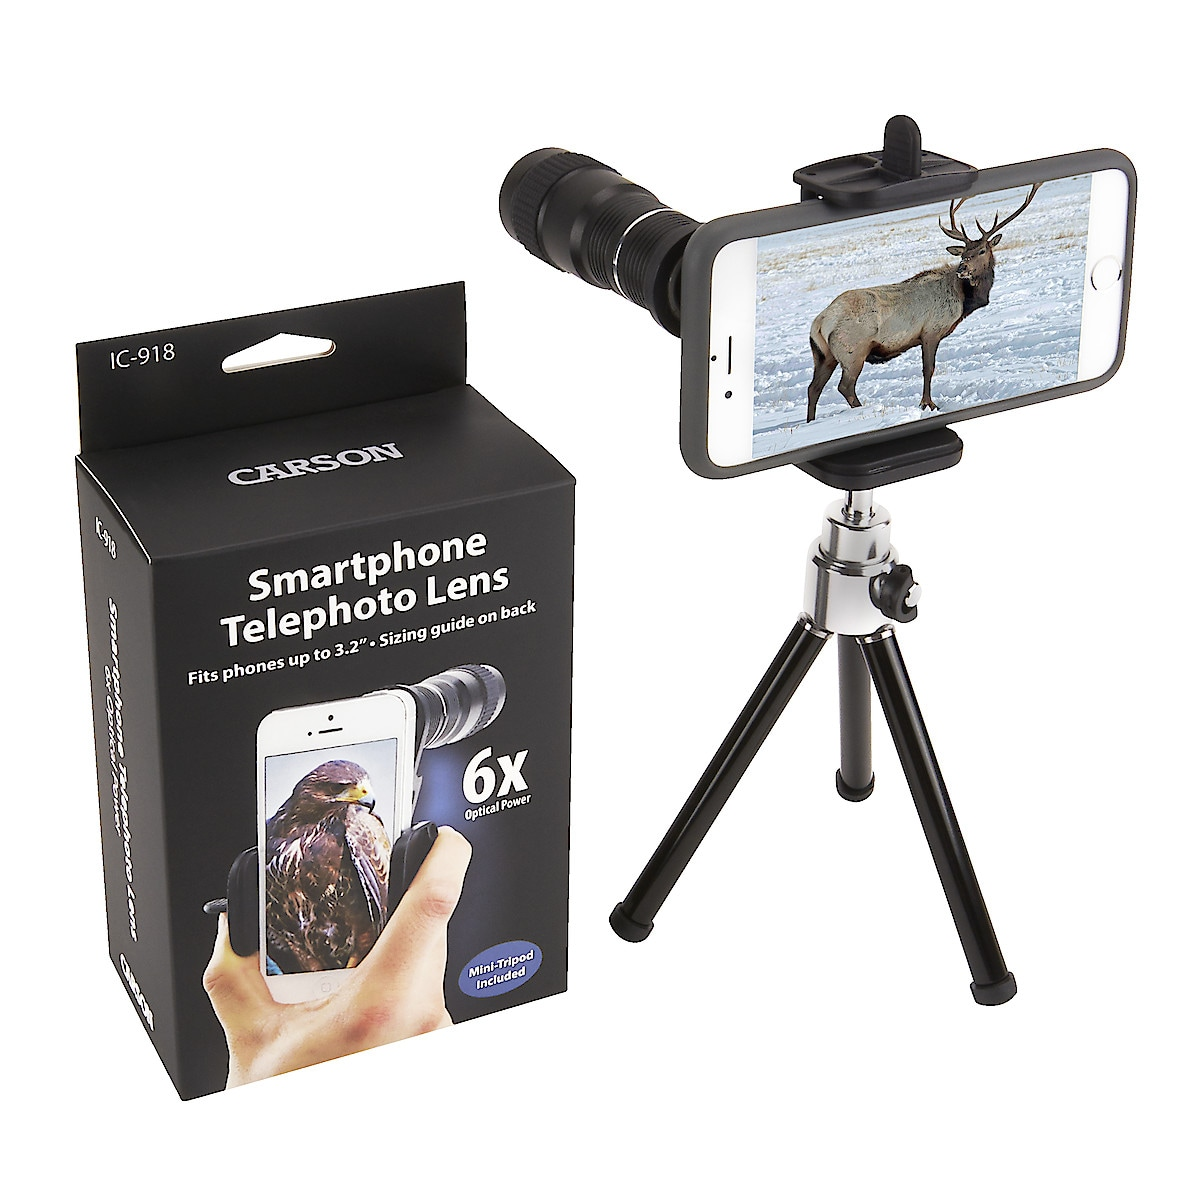 Objektiv für Smartphone Carson HookUpz 6x18 mm